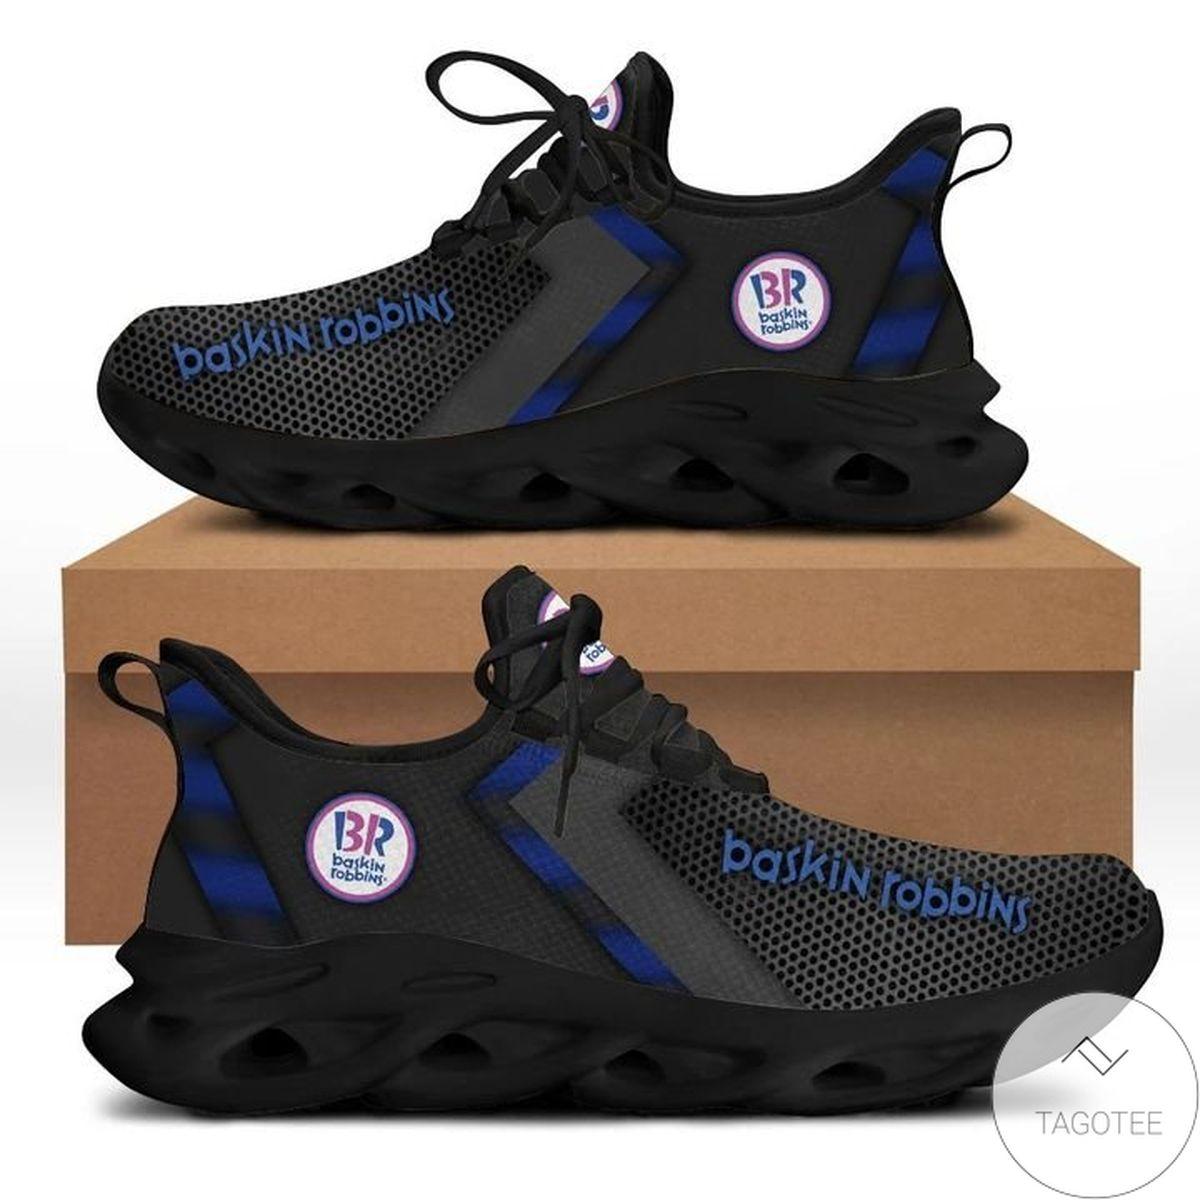 Baskin Robbins Max Soul Shoes